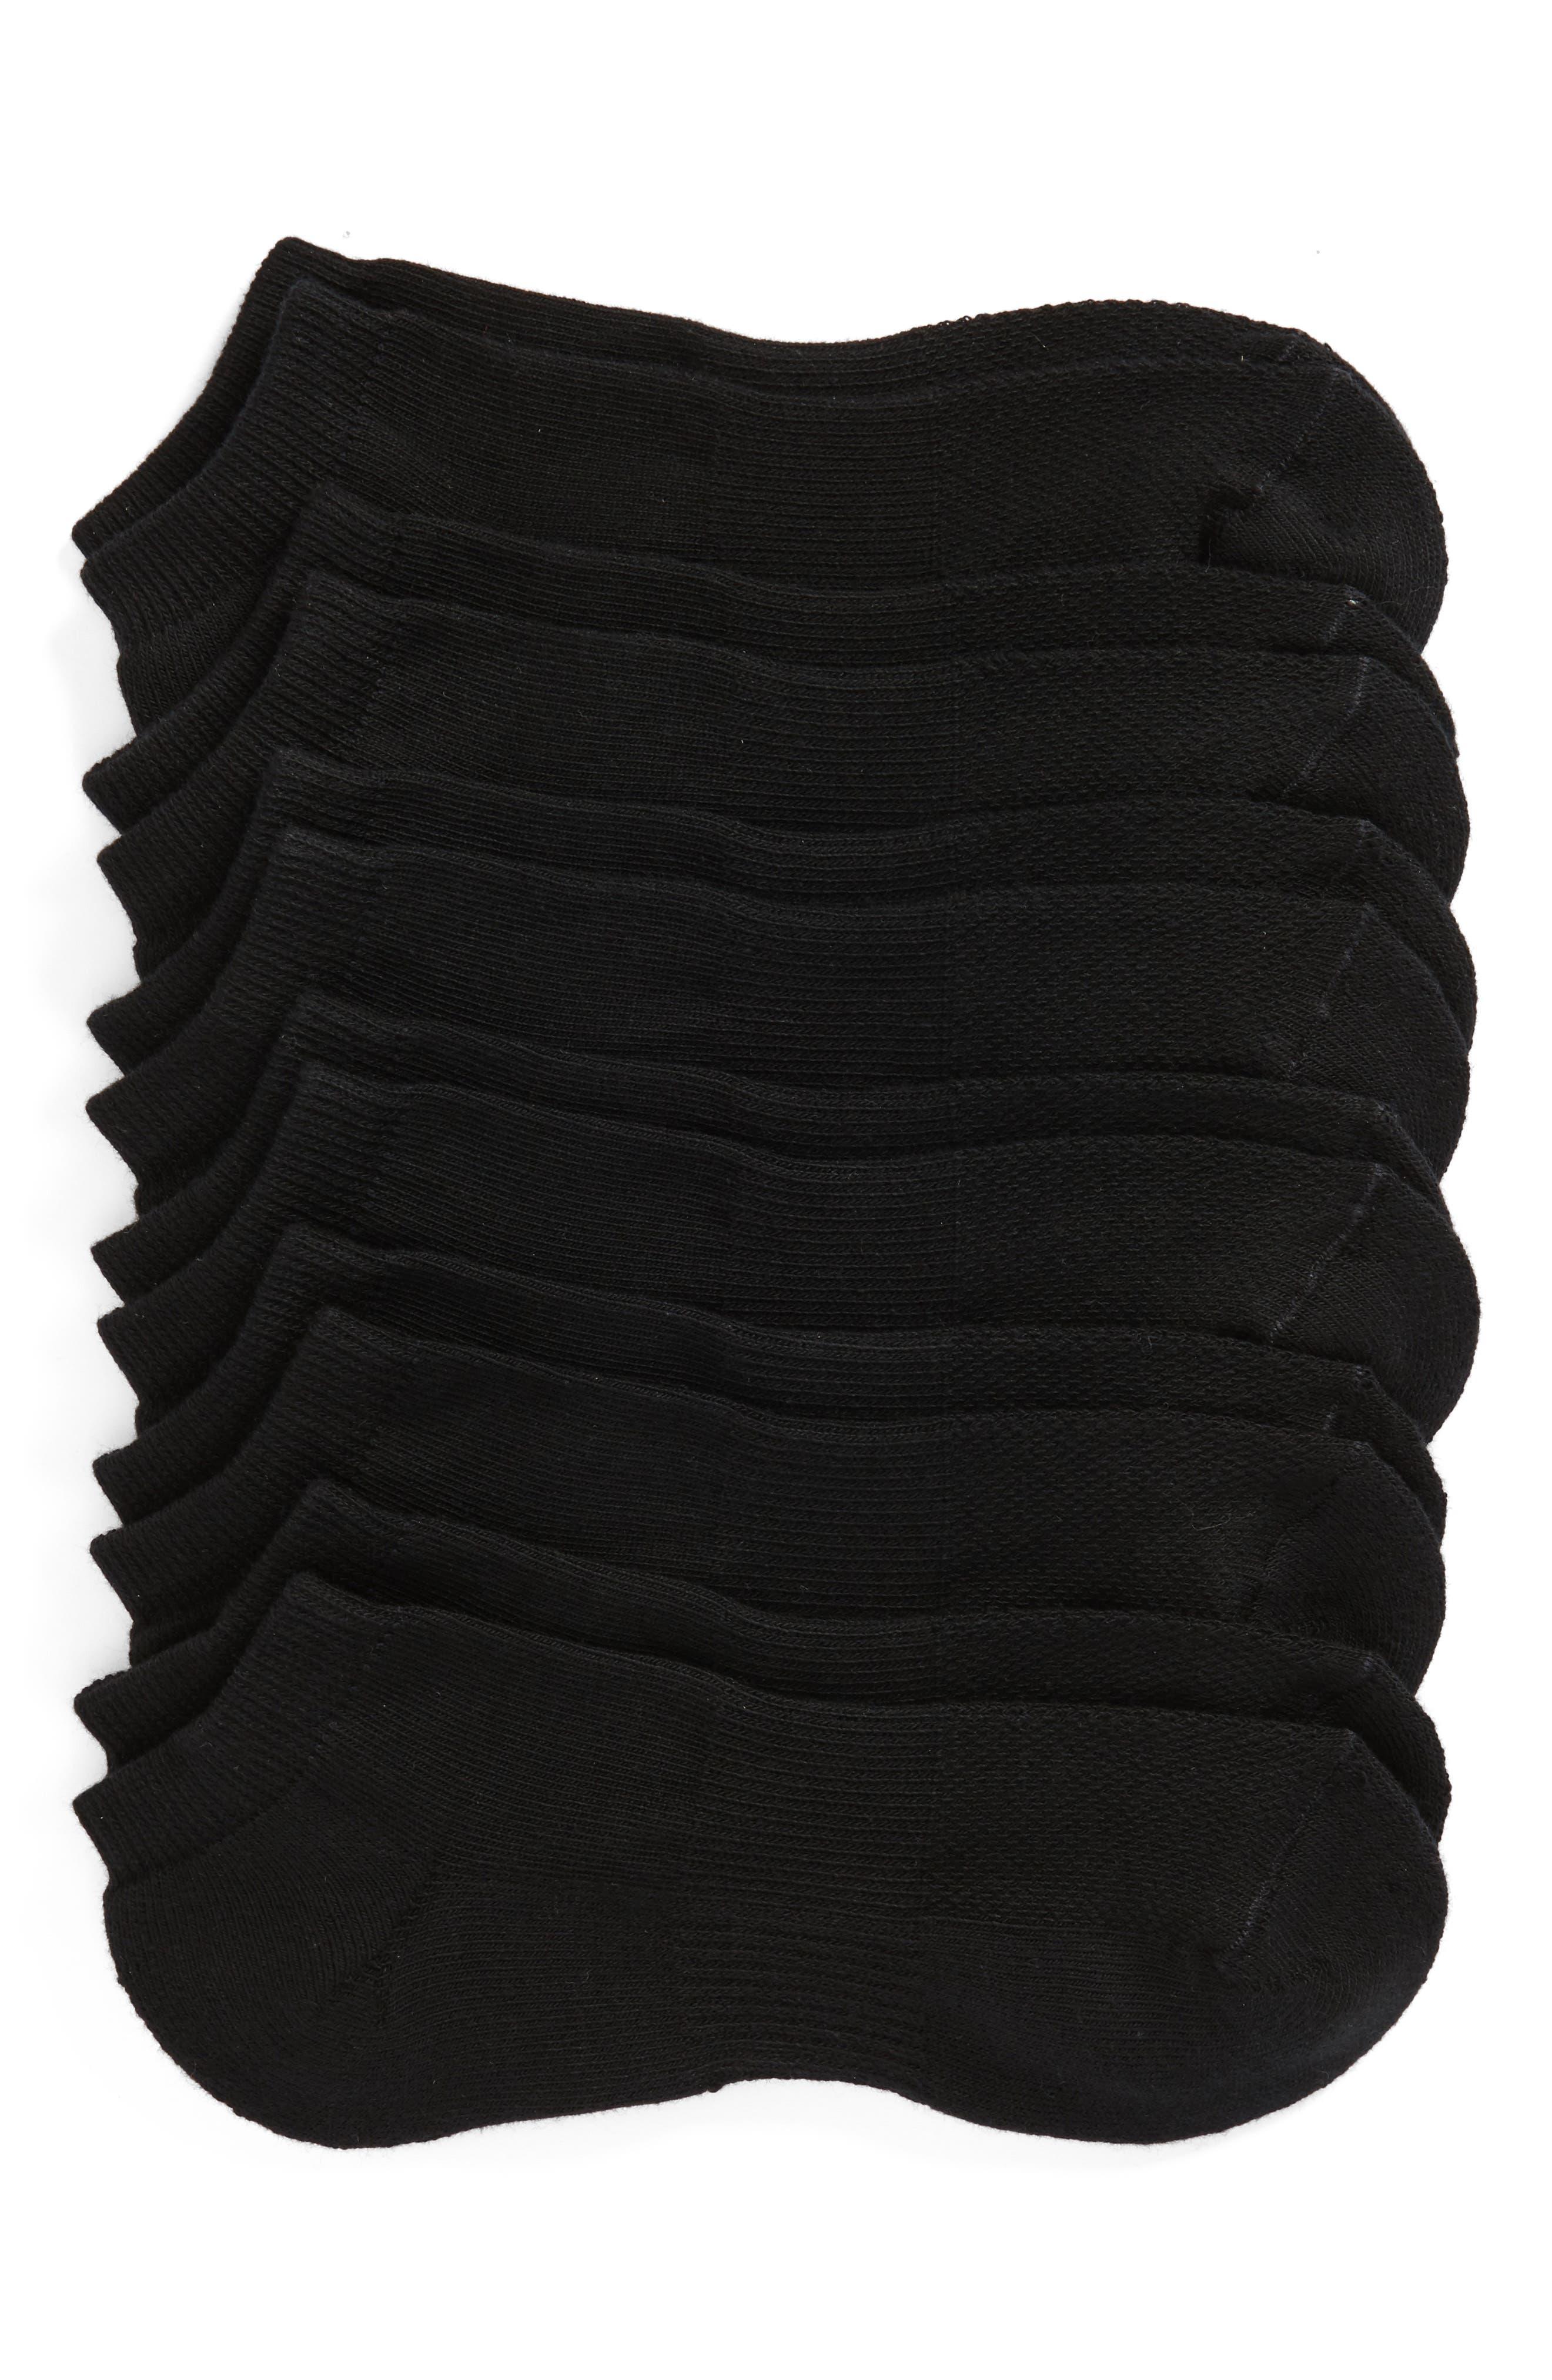 6-Pack Athletic No-Show Socks,                             Main thumbnail 1, color,                             Black